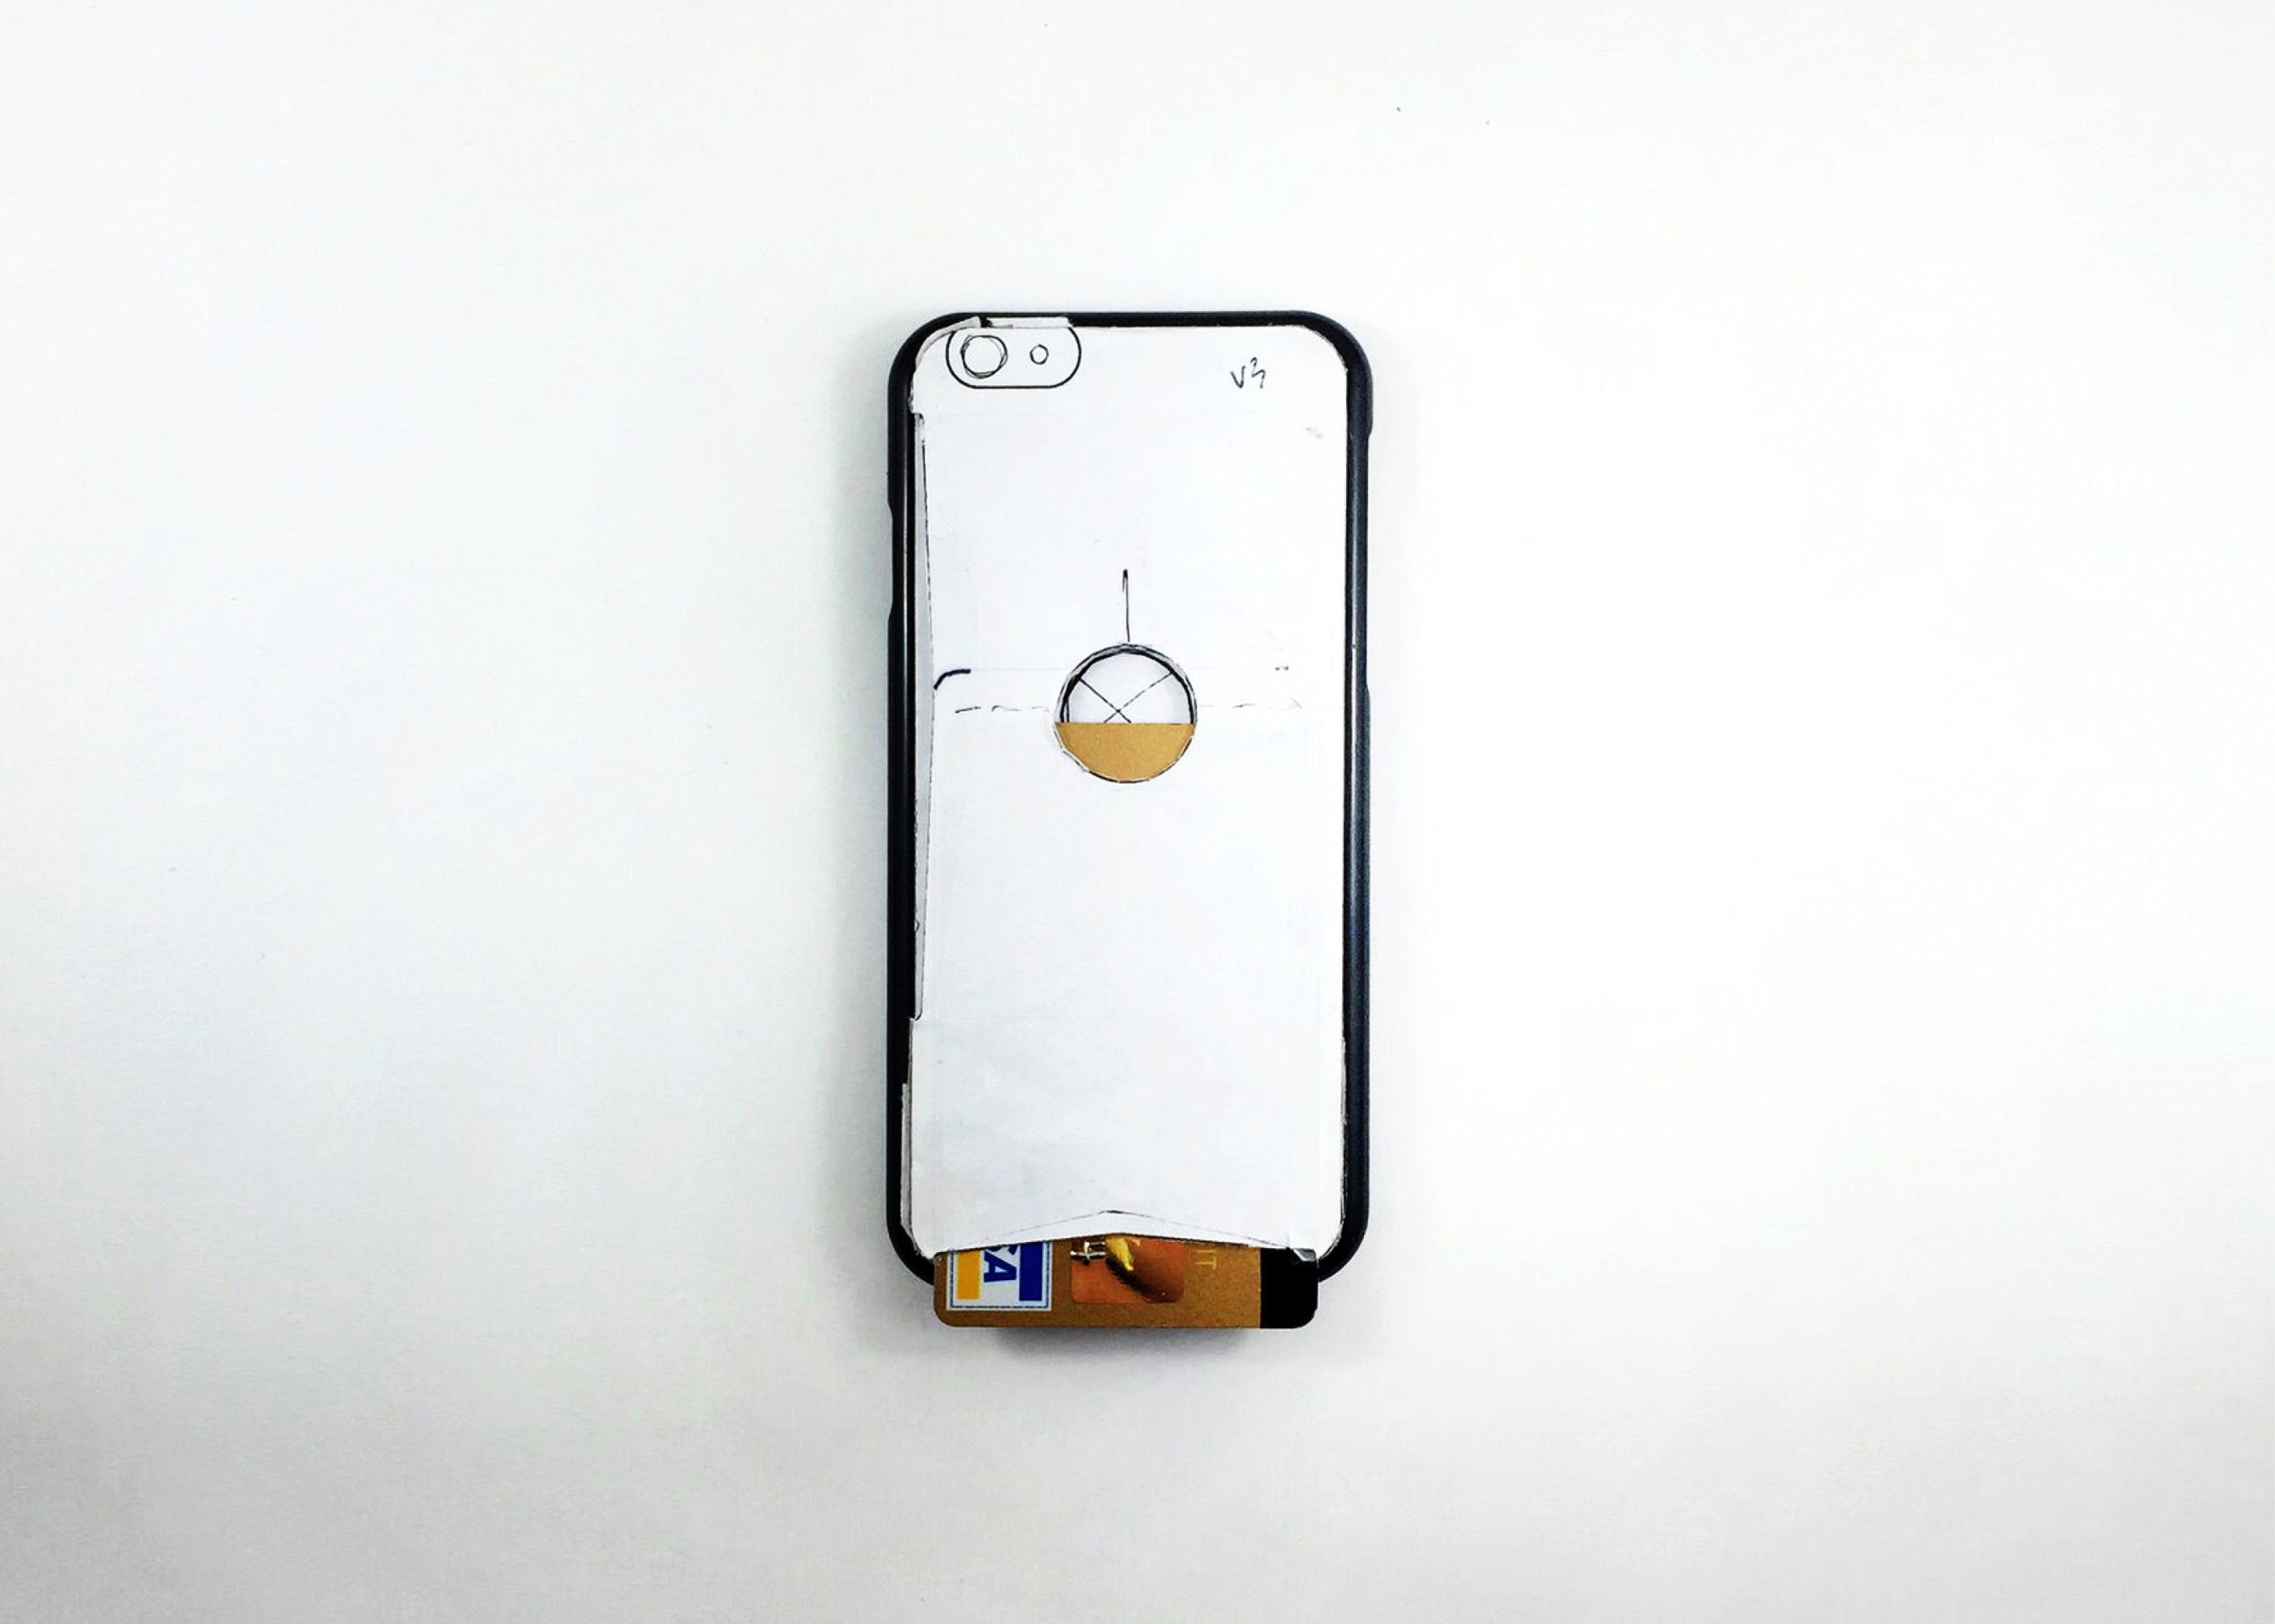 Bellroy iPhone Presentation.jpg